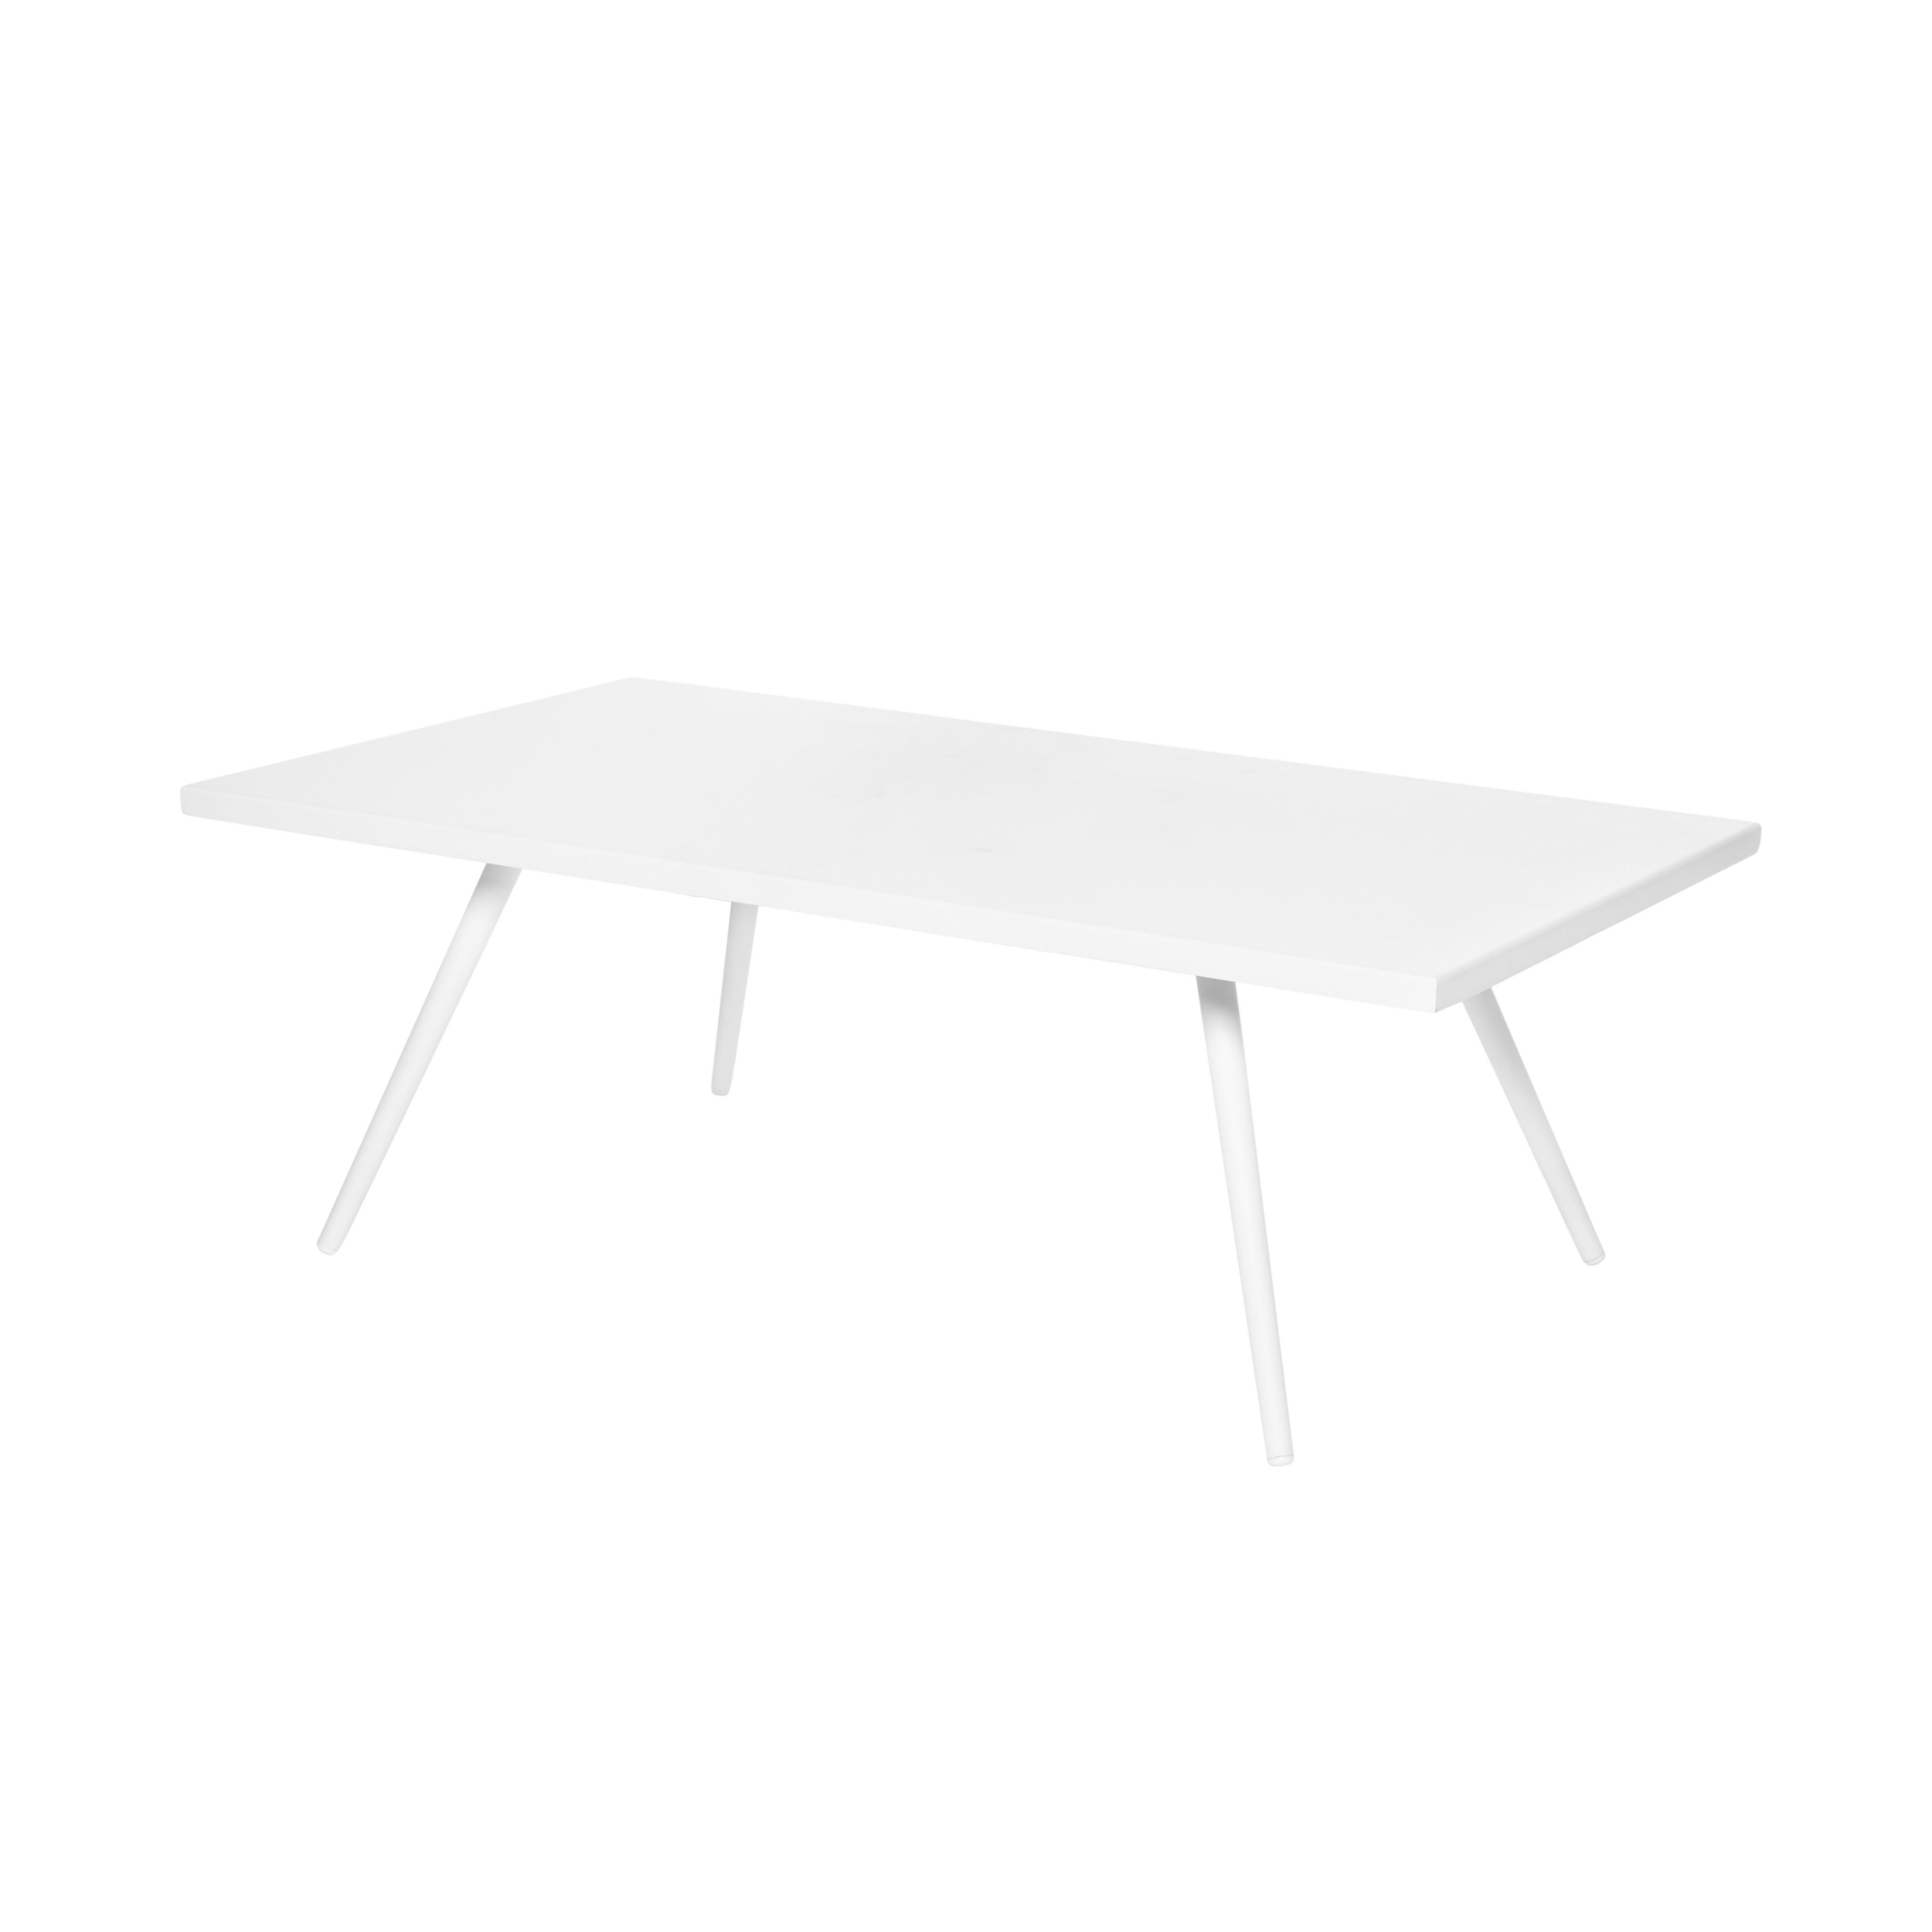 Tavolino alluminio verniciato Cancun, Bianco, large image number 0